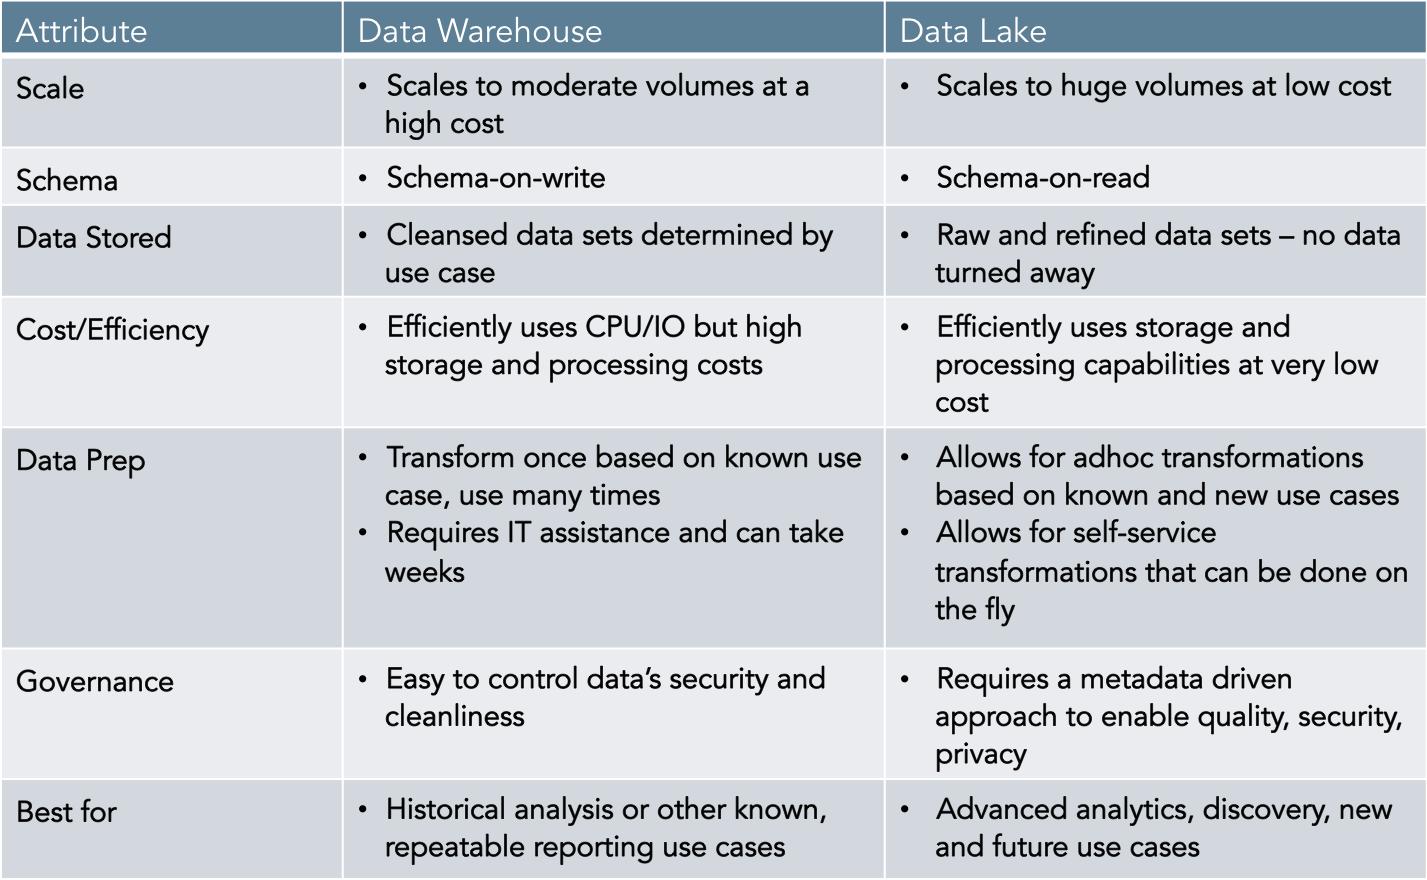 Difference-Data Lake & Data Warehouse